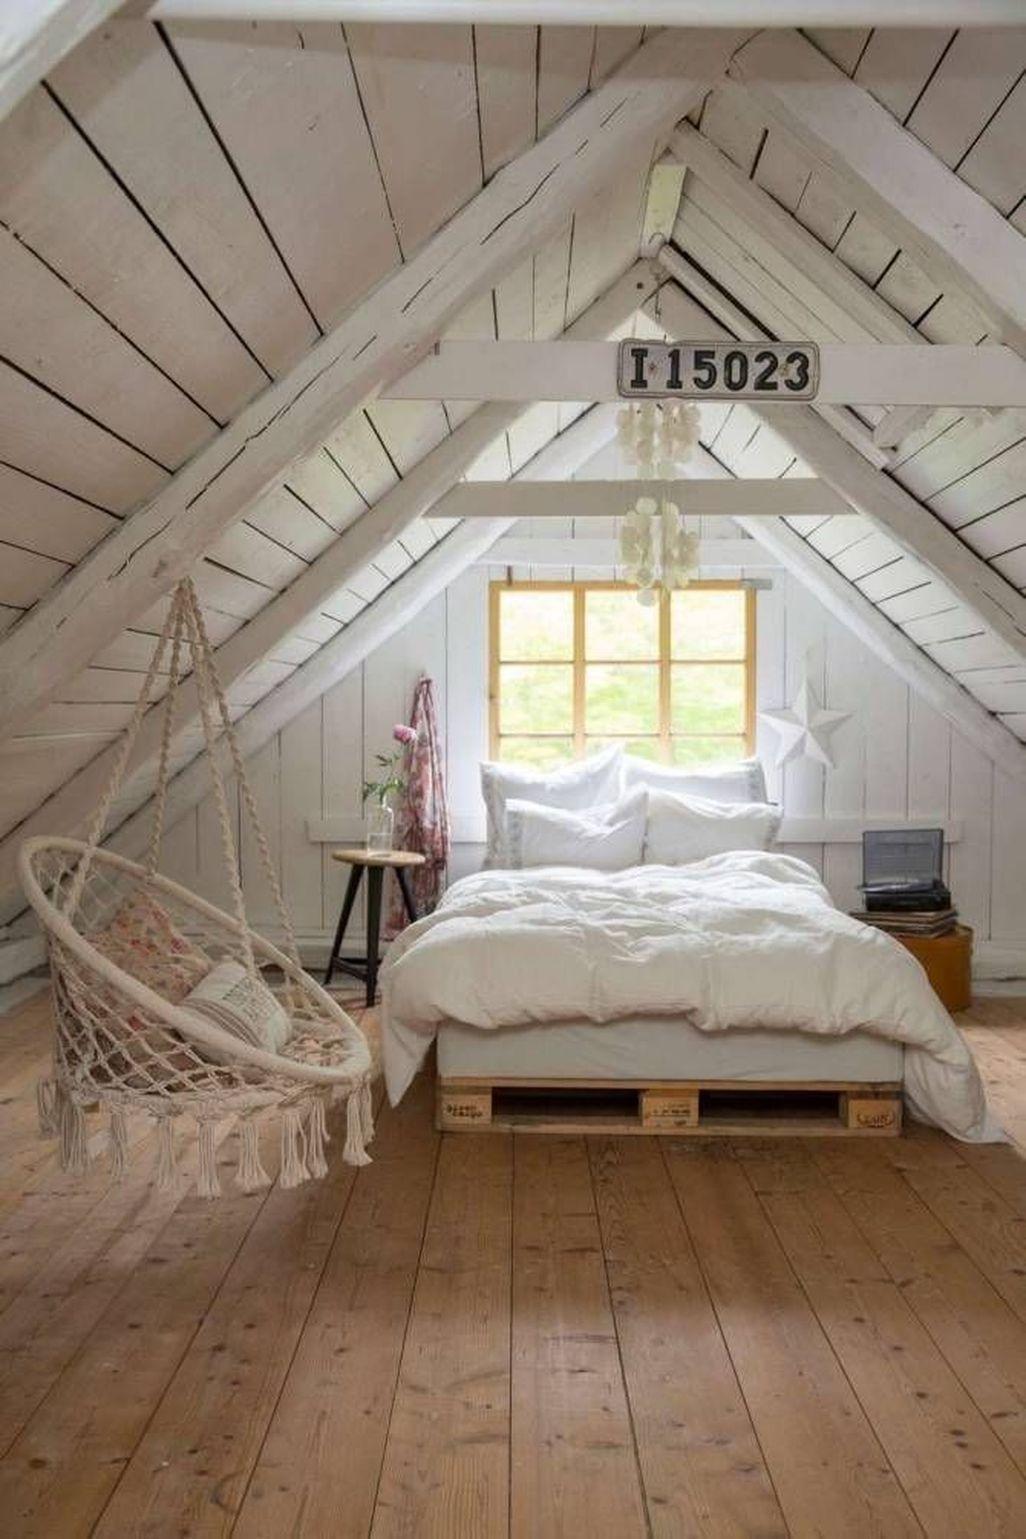 7 Incredible Brady Bunch Attic Bedroom Episode Ideas In 2020 Cottage Style Bedrooms Attic Bedroom Small Bedroom Loft